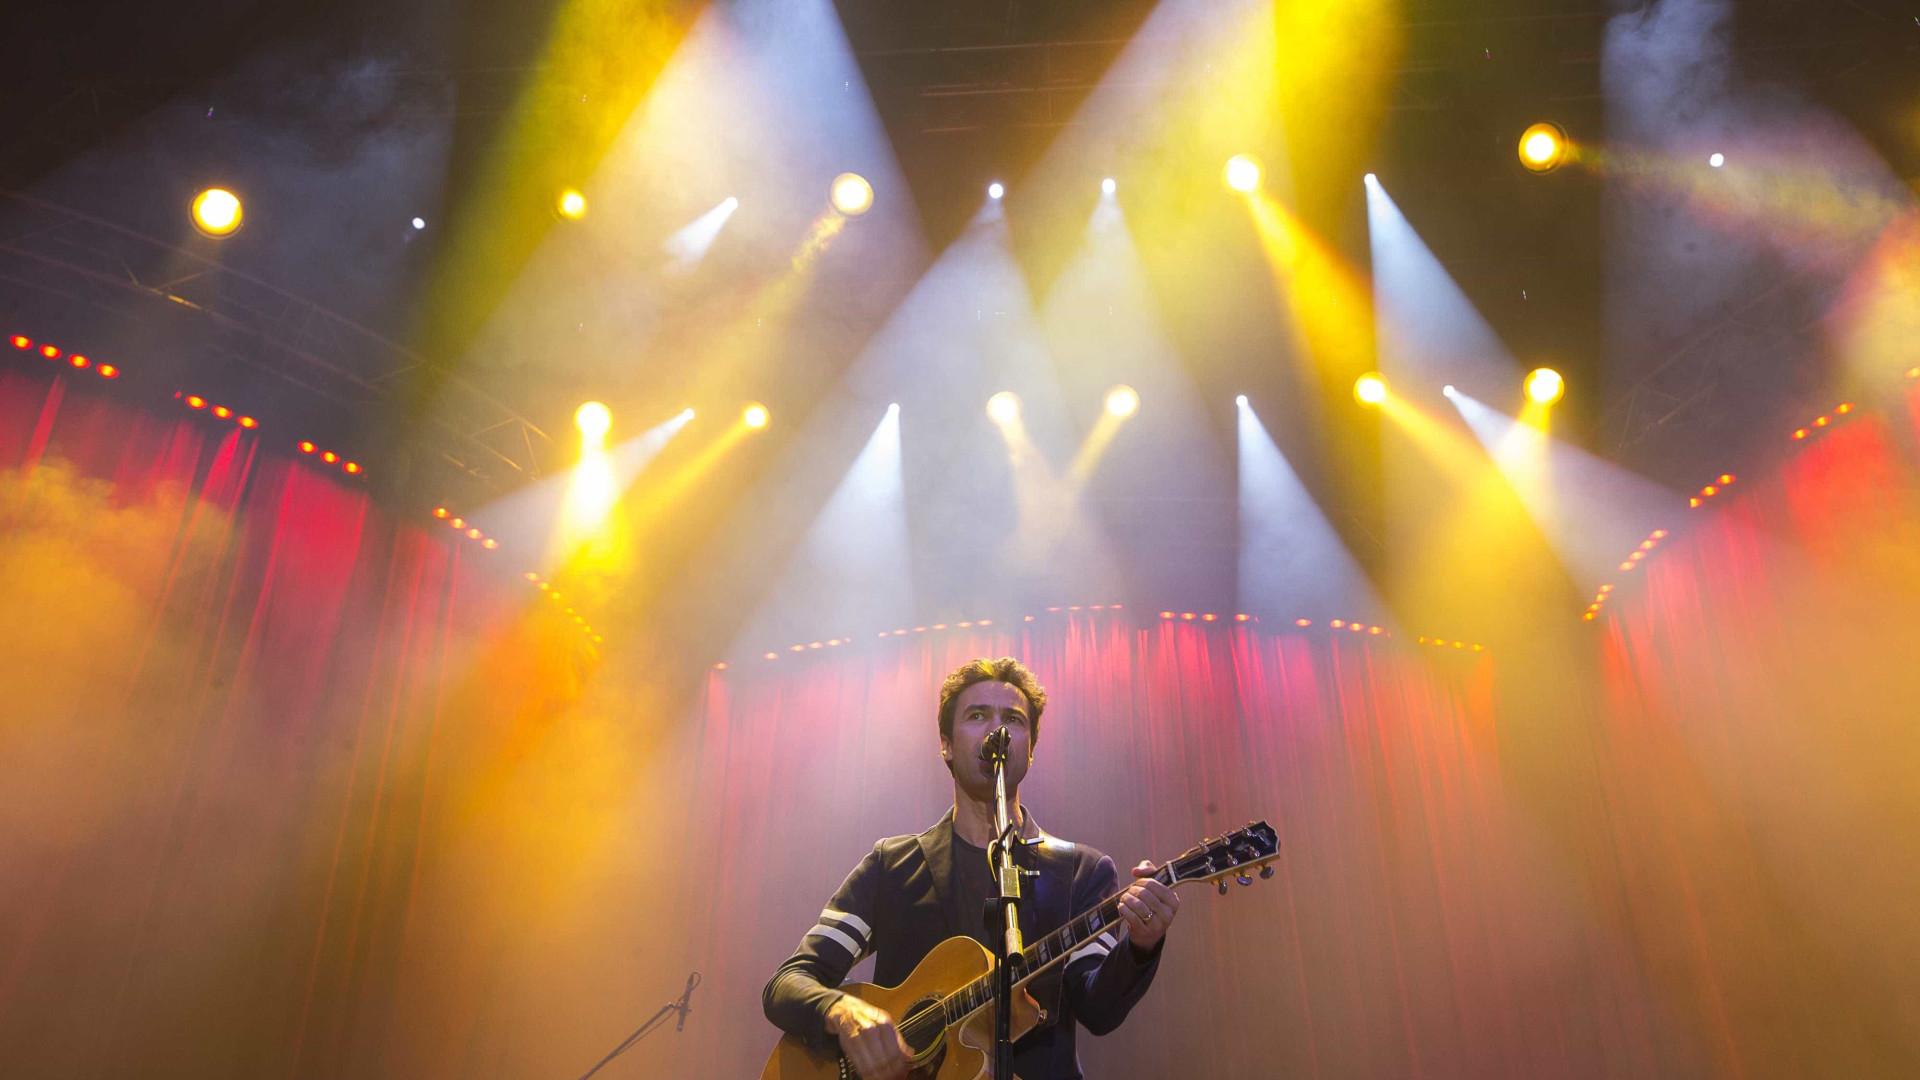 David Fonseca dá concerto gratuito hoje no Chiado